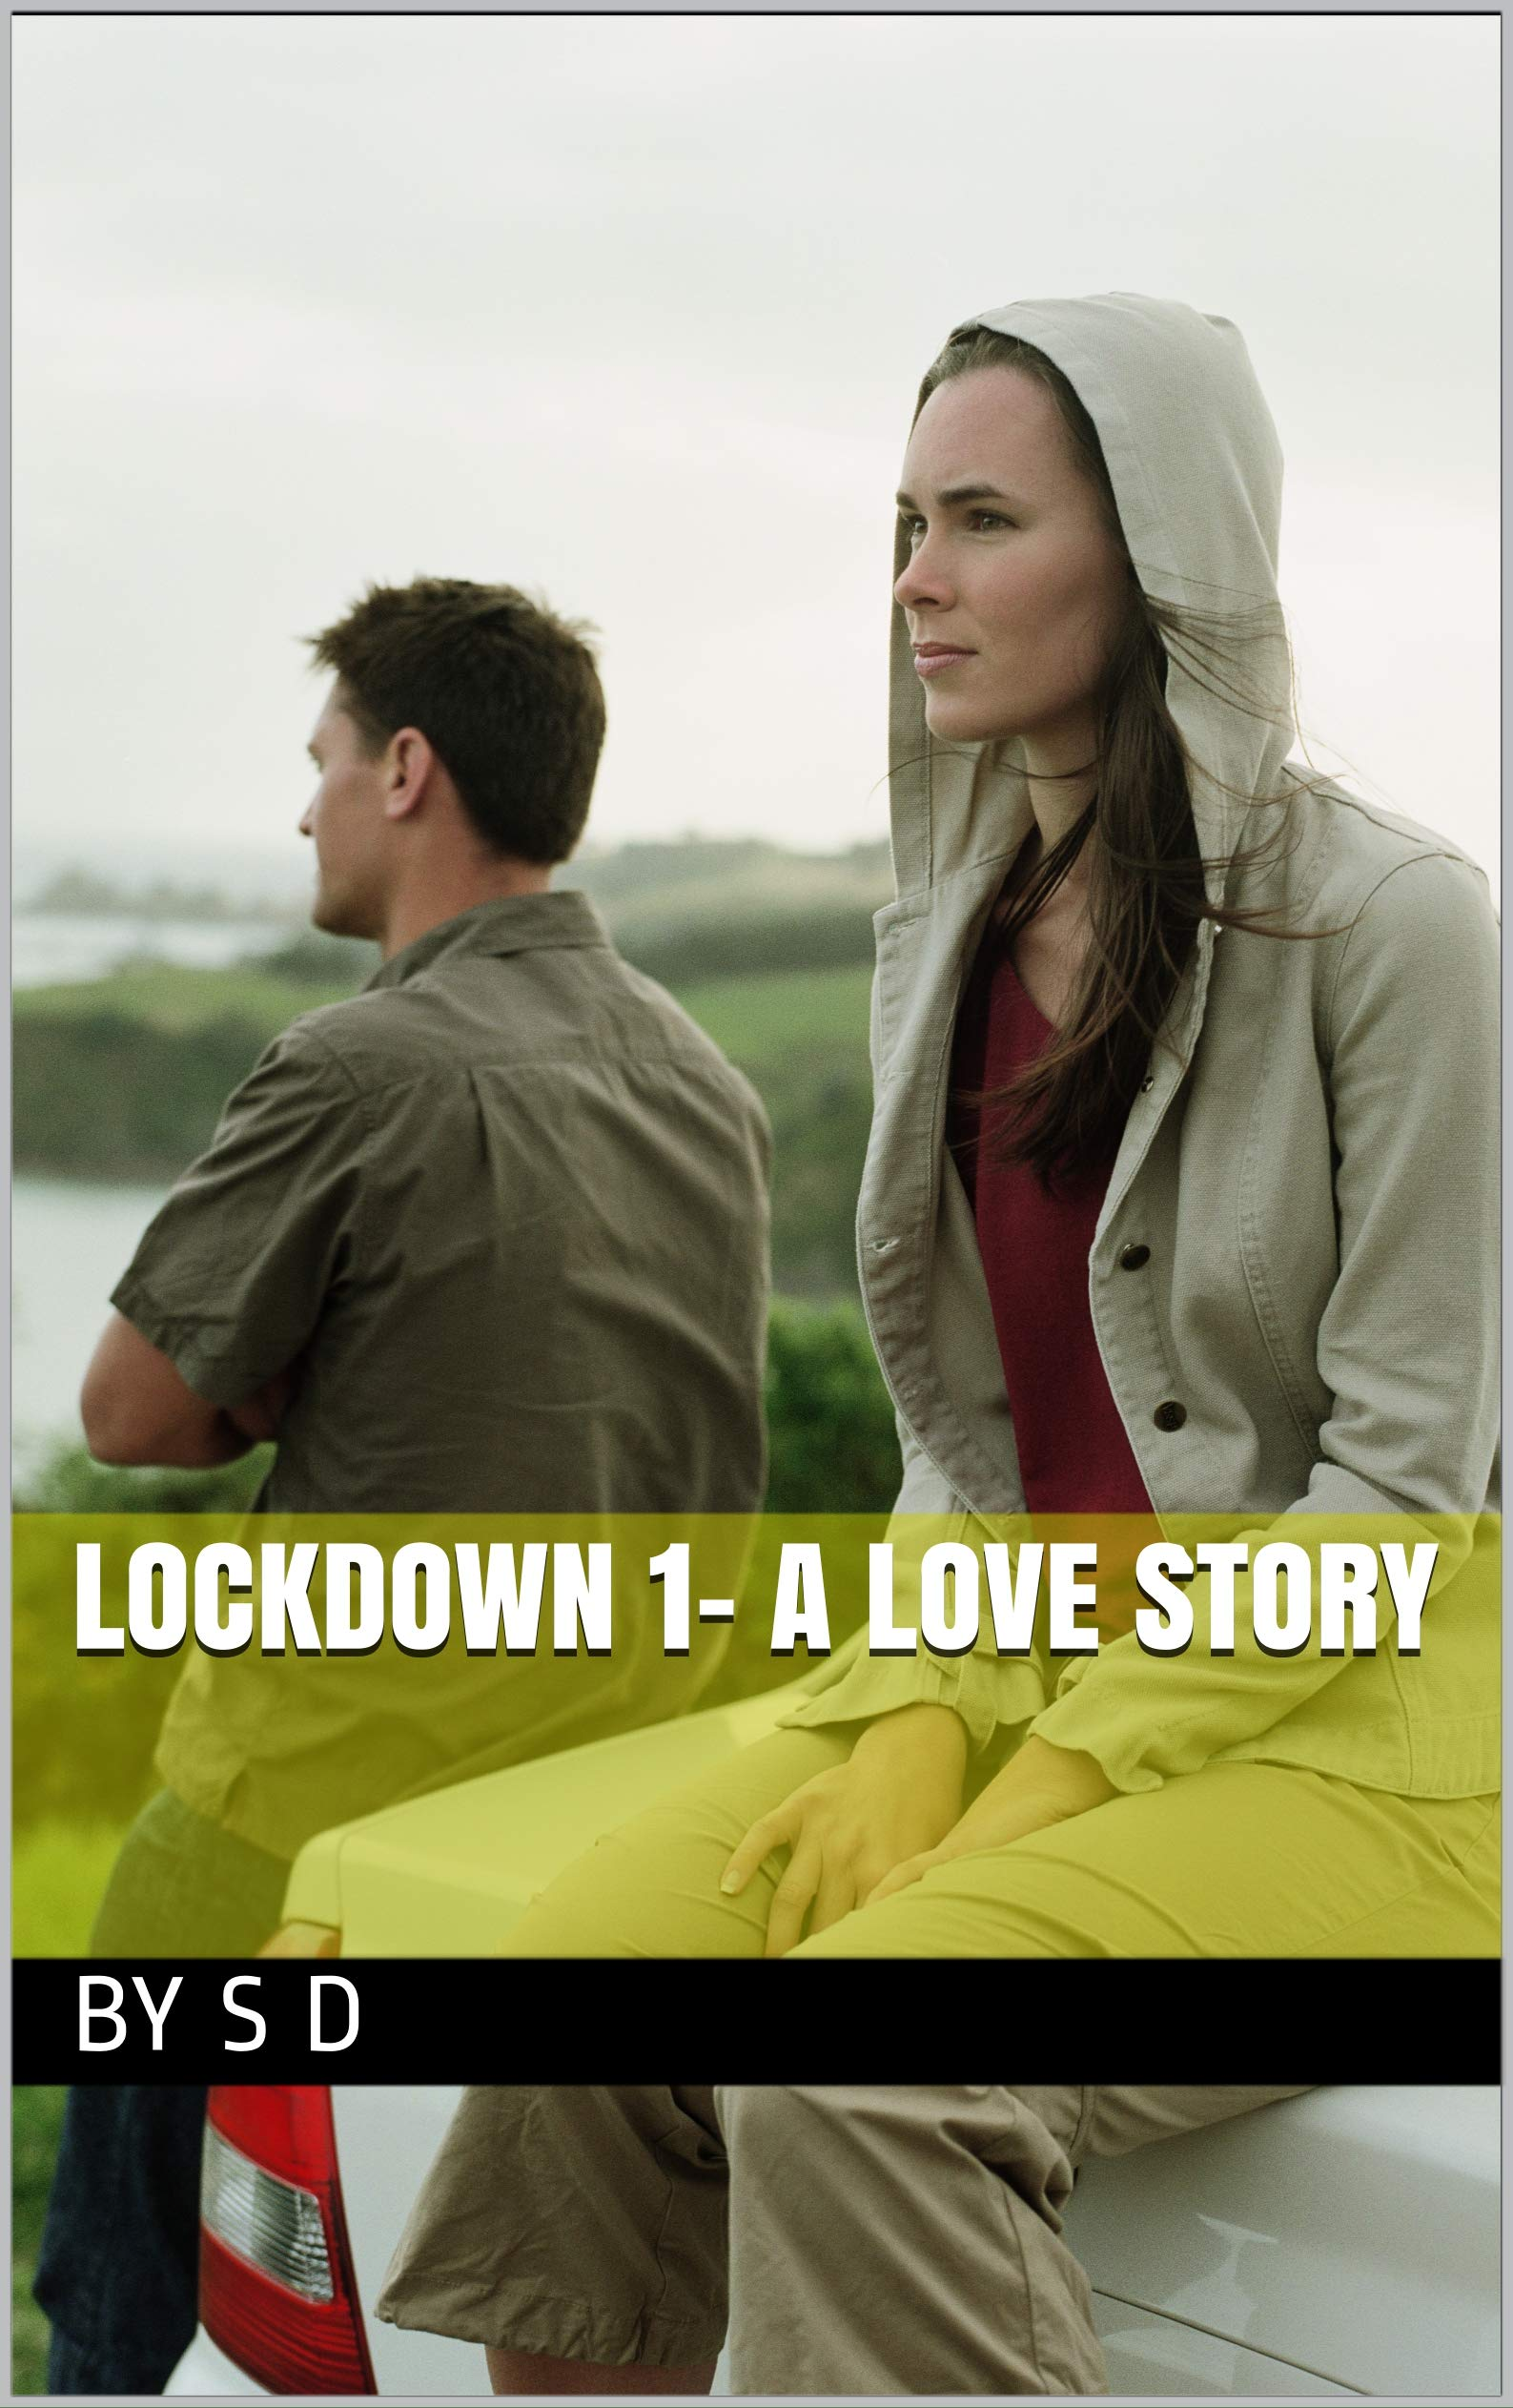 Lockdown 1- A LOVE STORY